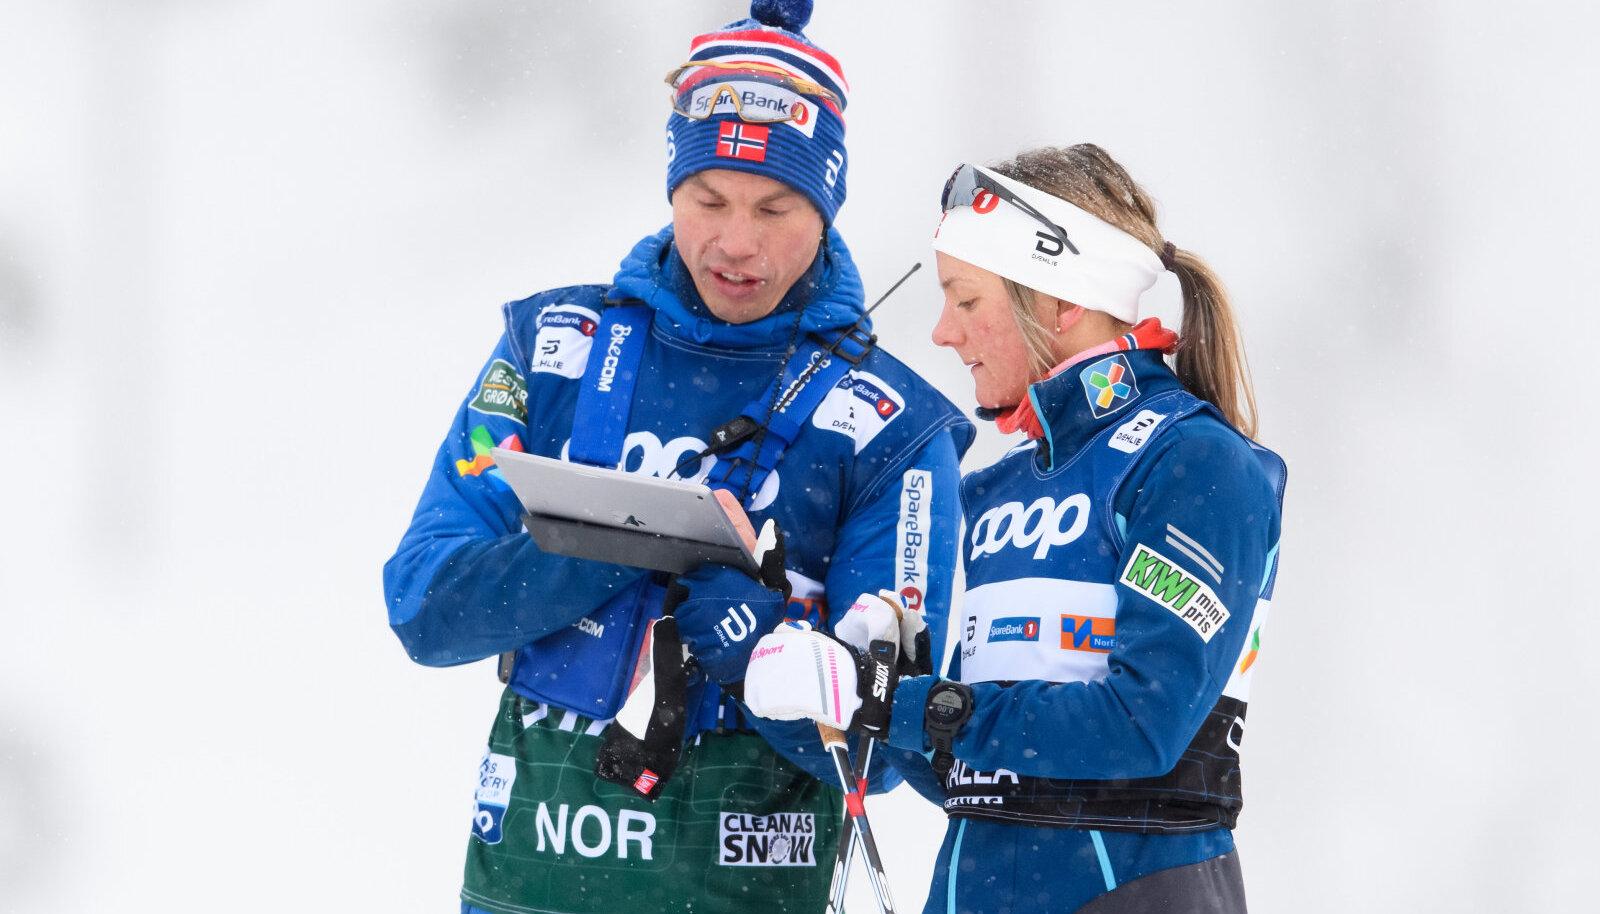 Geir Endre Rogn ja Maiken Caspersen Falla